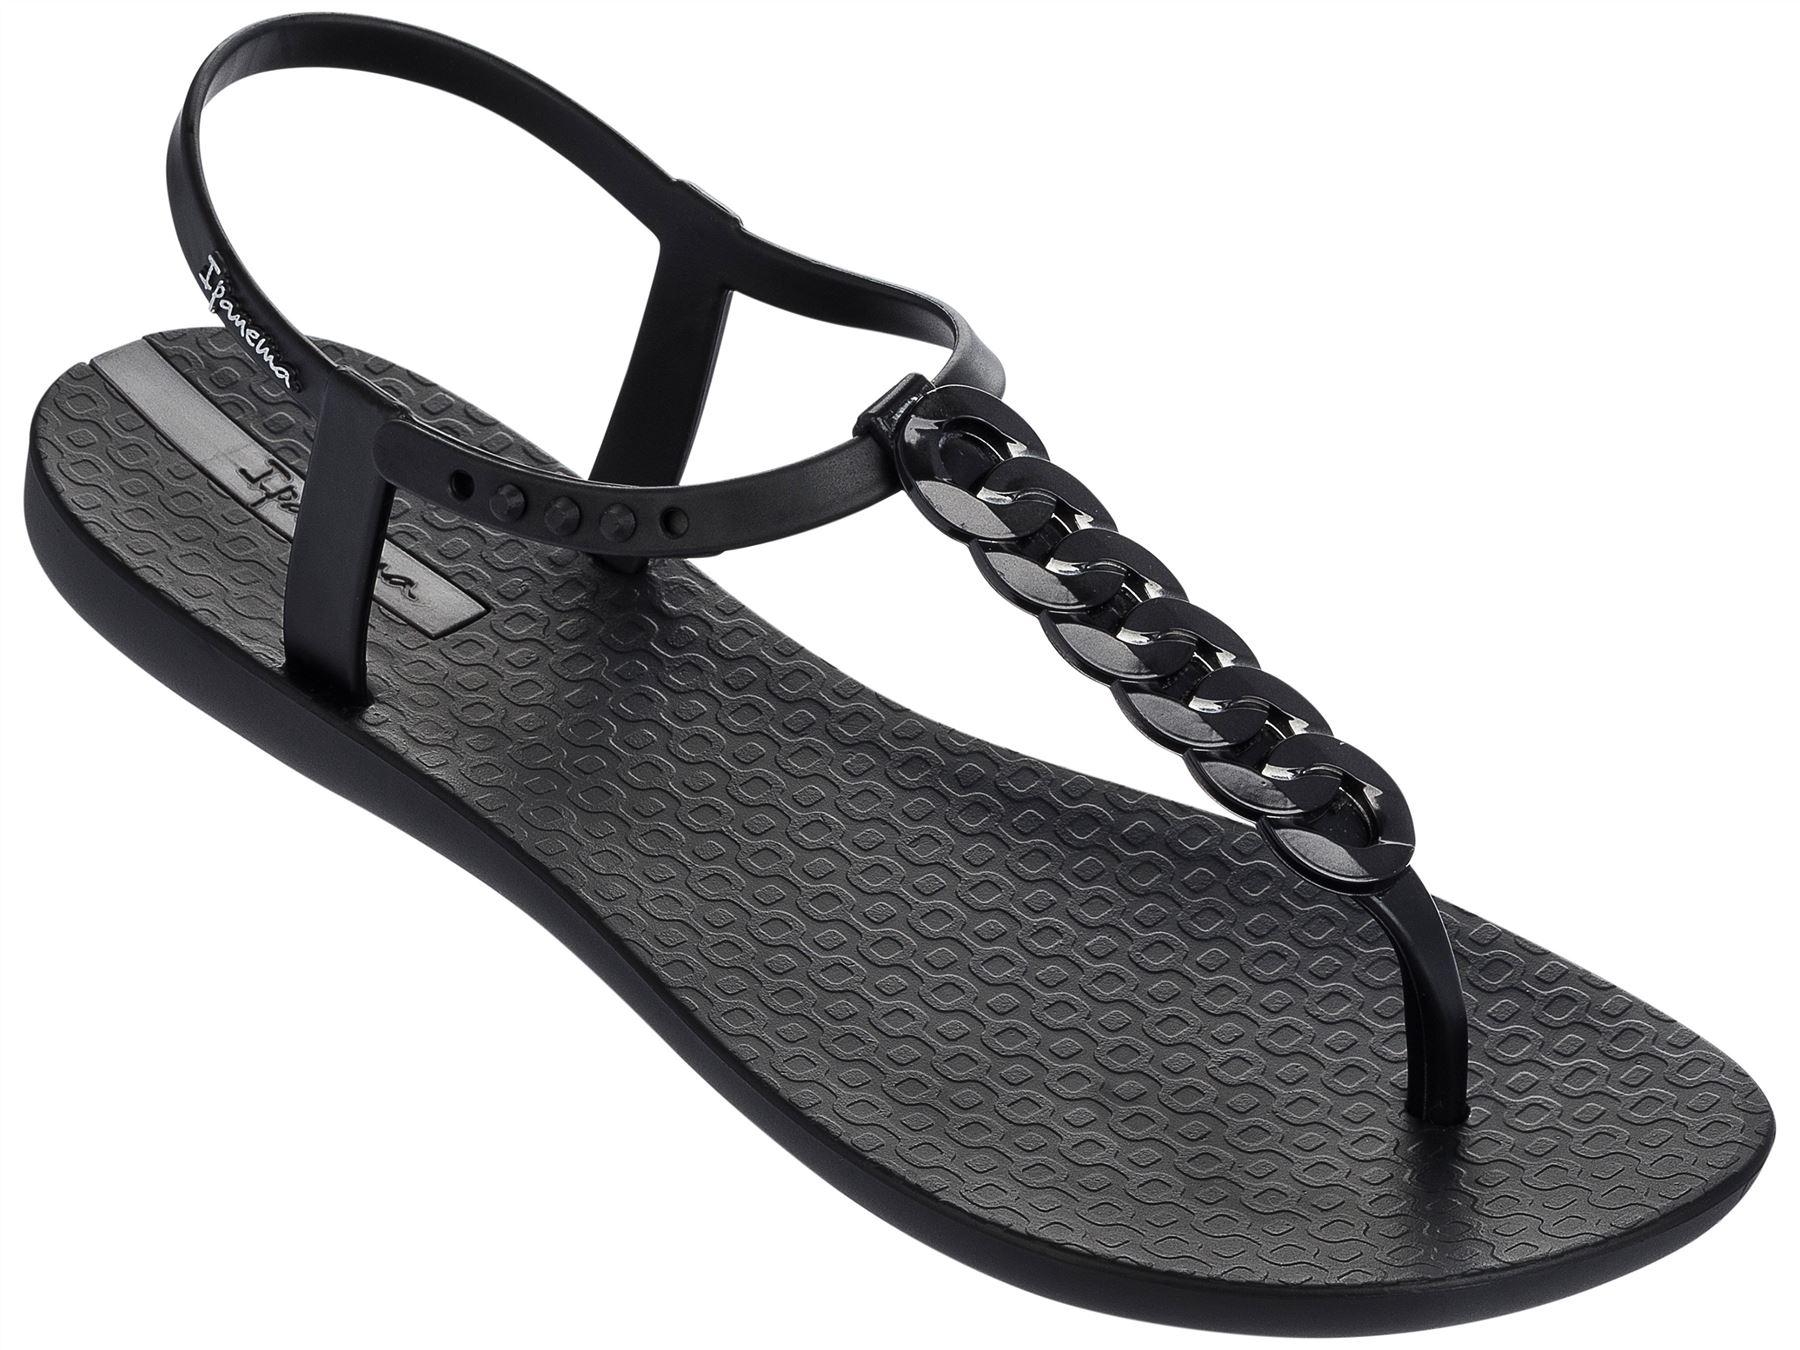 Ipanema Links T-Strap Flip Flops Beach Sandals 81932A  Ebay-1579